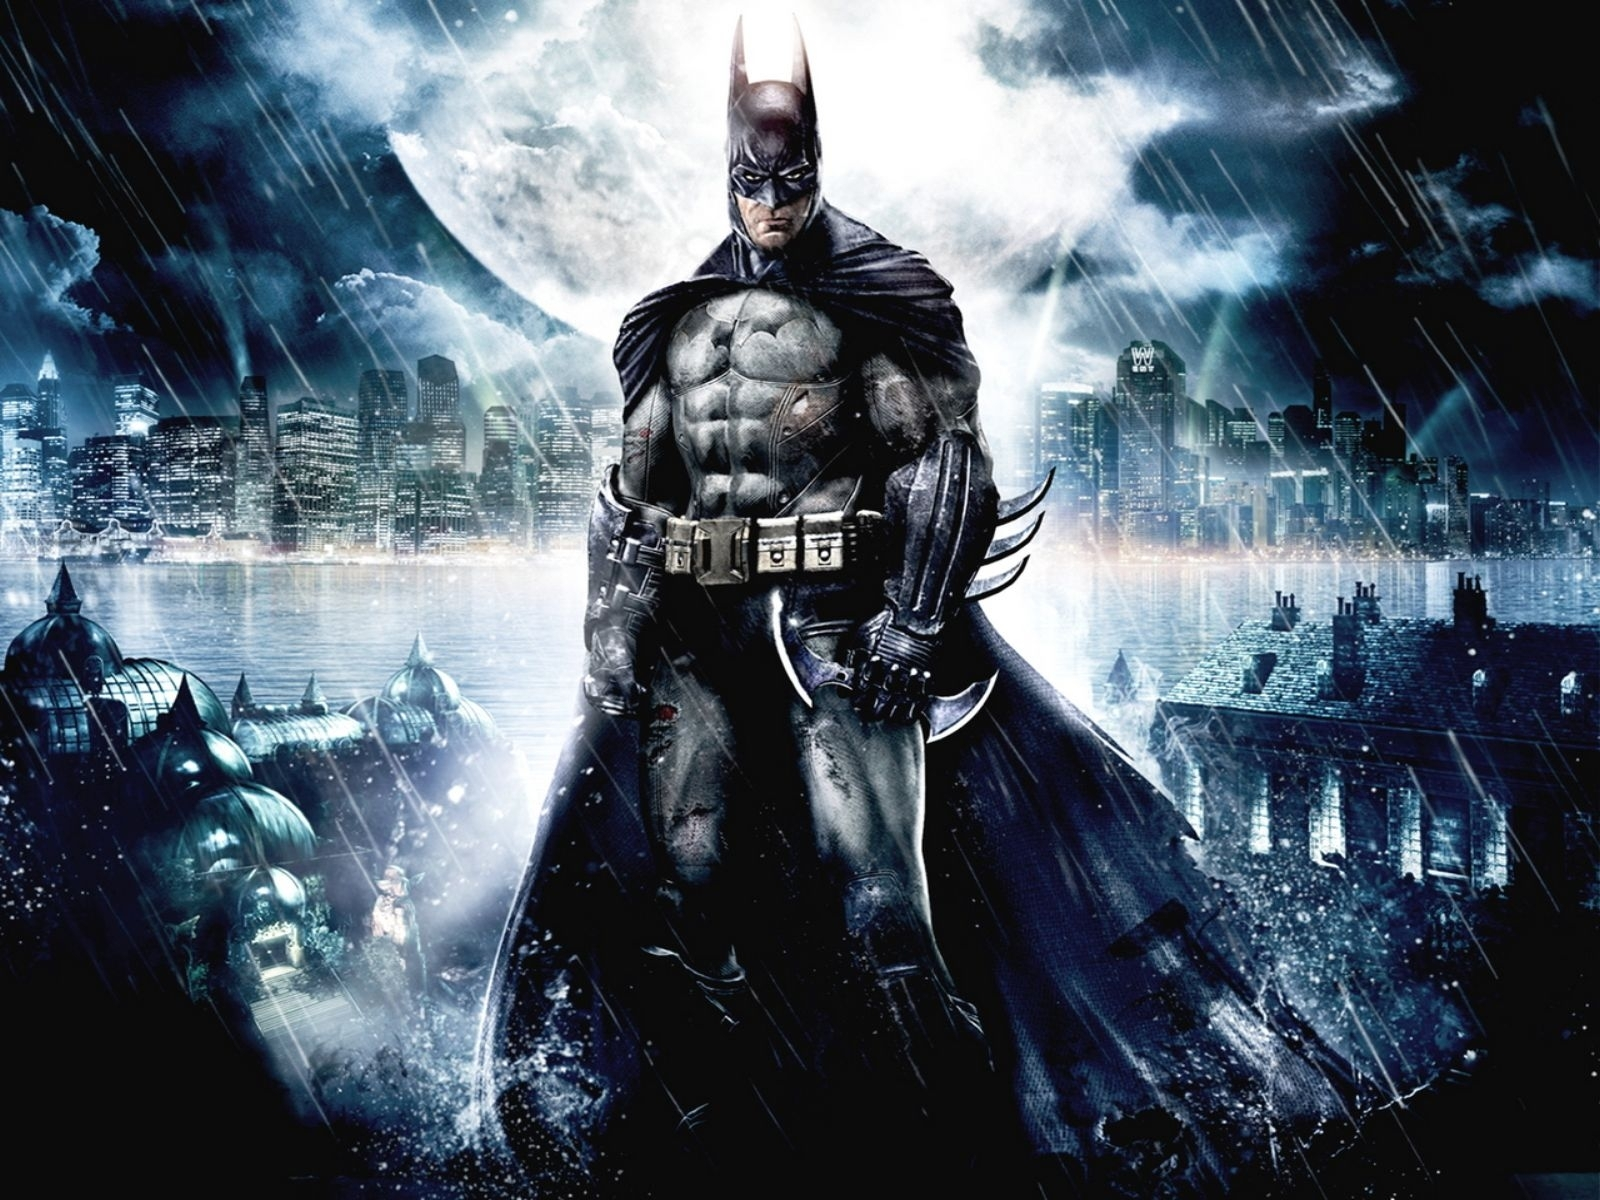 Free Download Best Wallpapers Ever: Batman HD Wallpapers 1080p